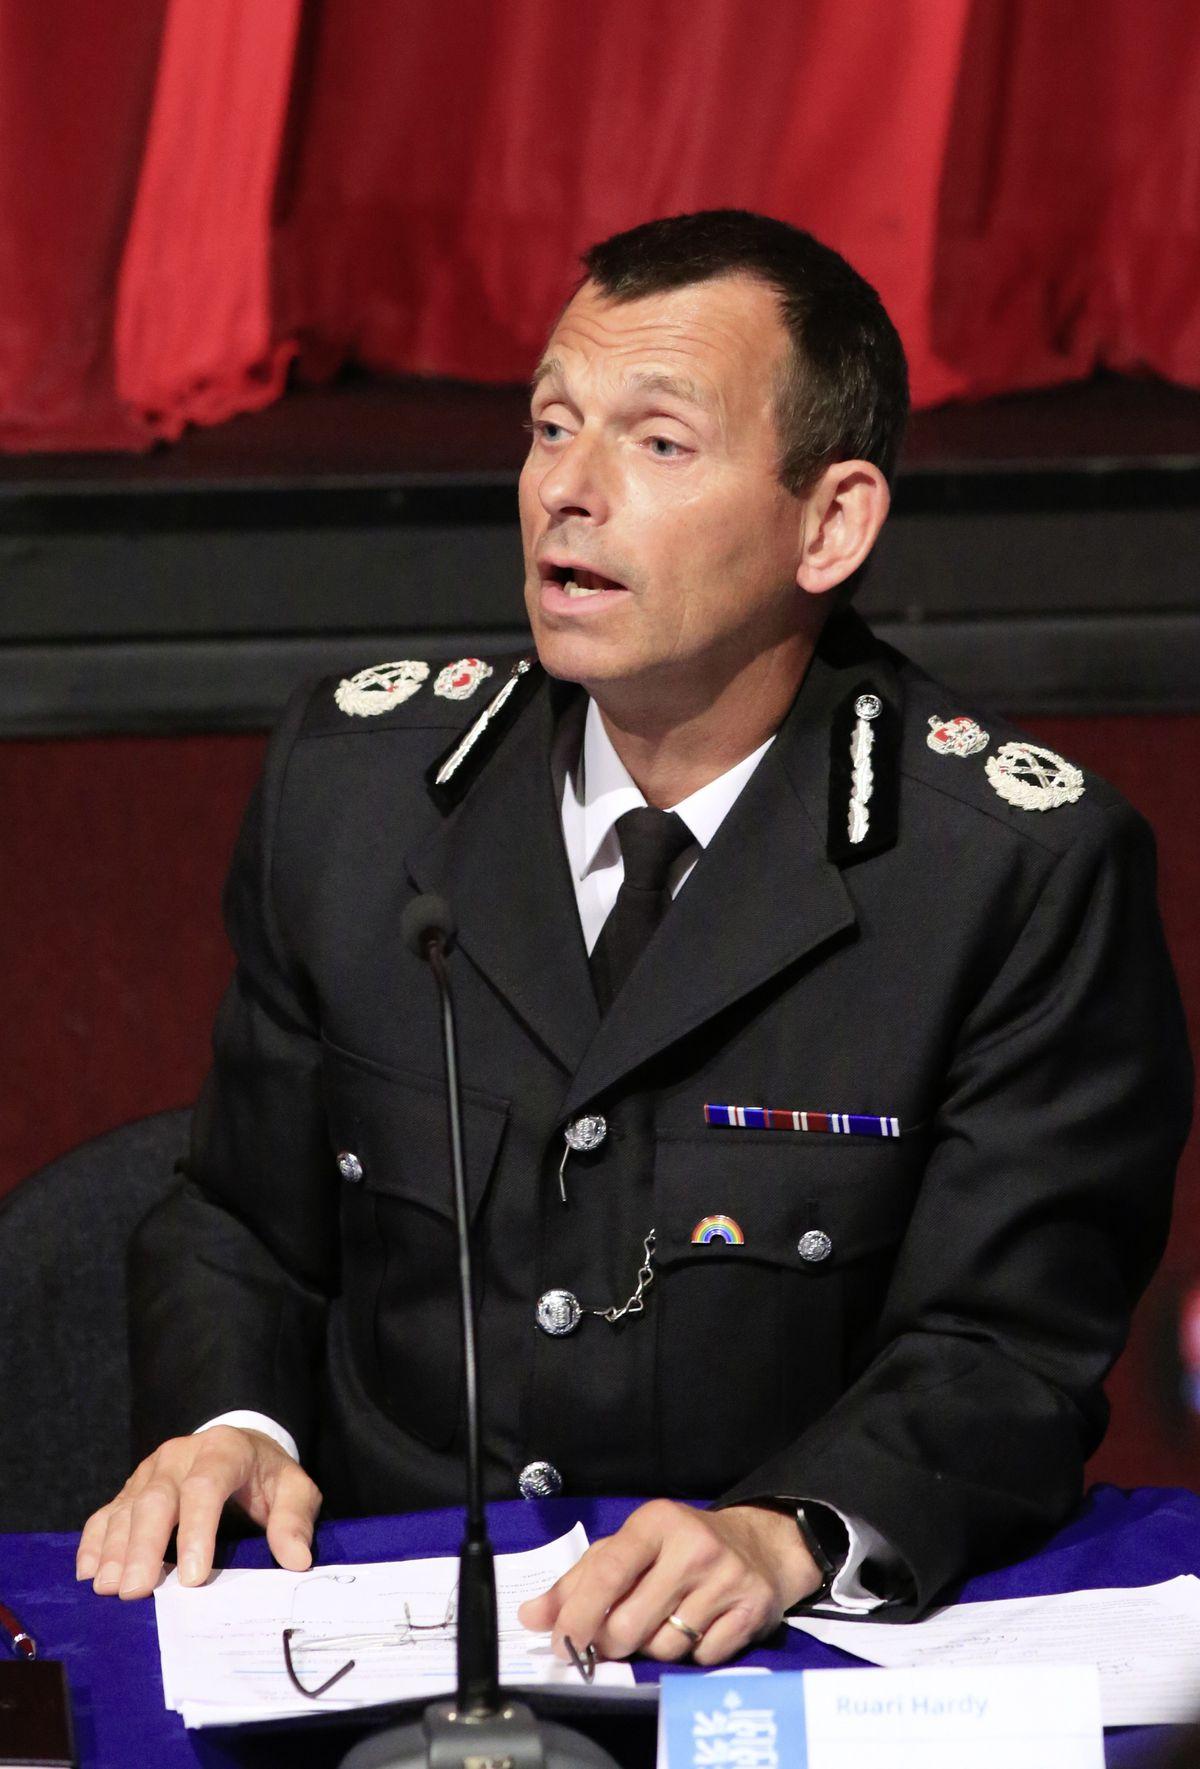 Head of Law Enforcement Ruari Hardy. (28359305)